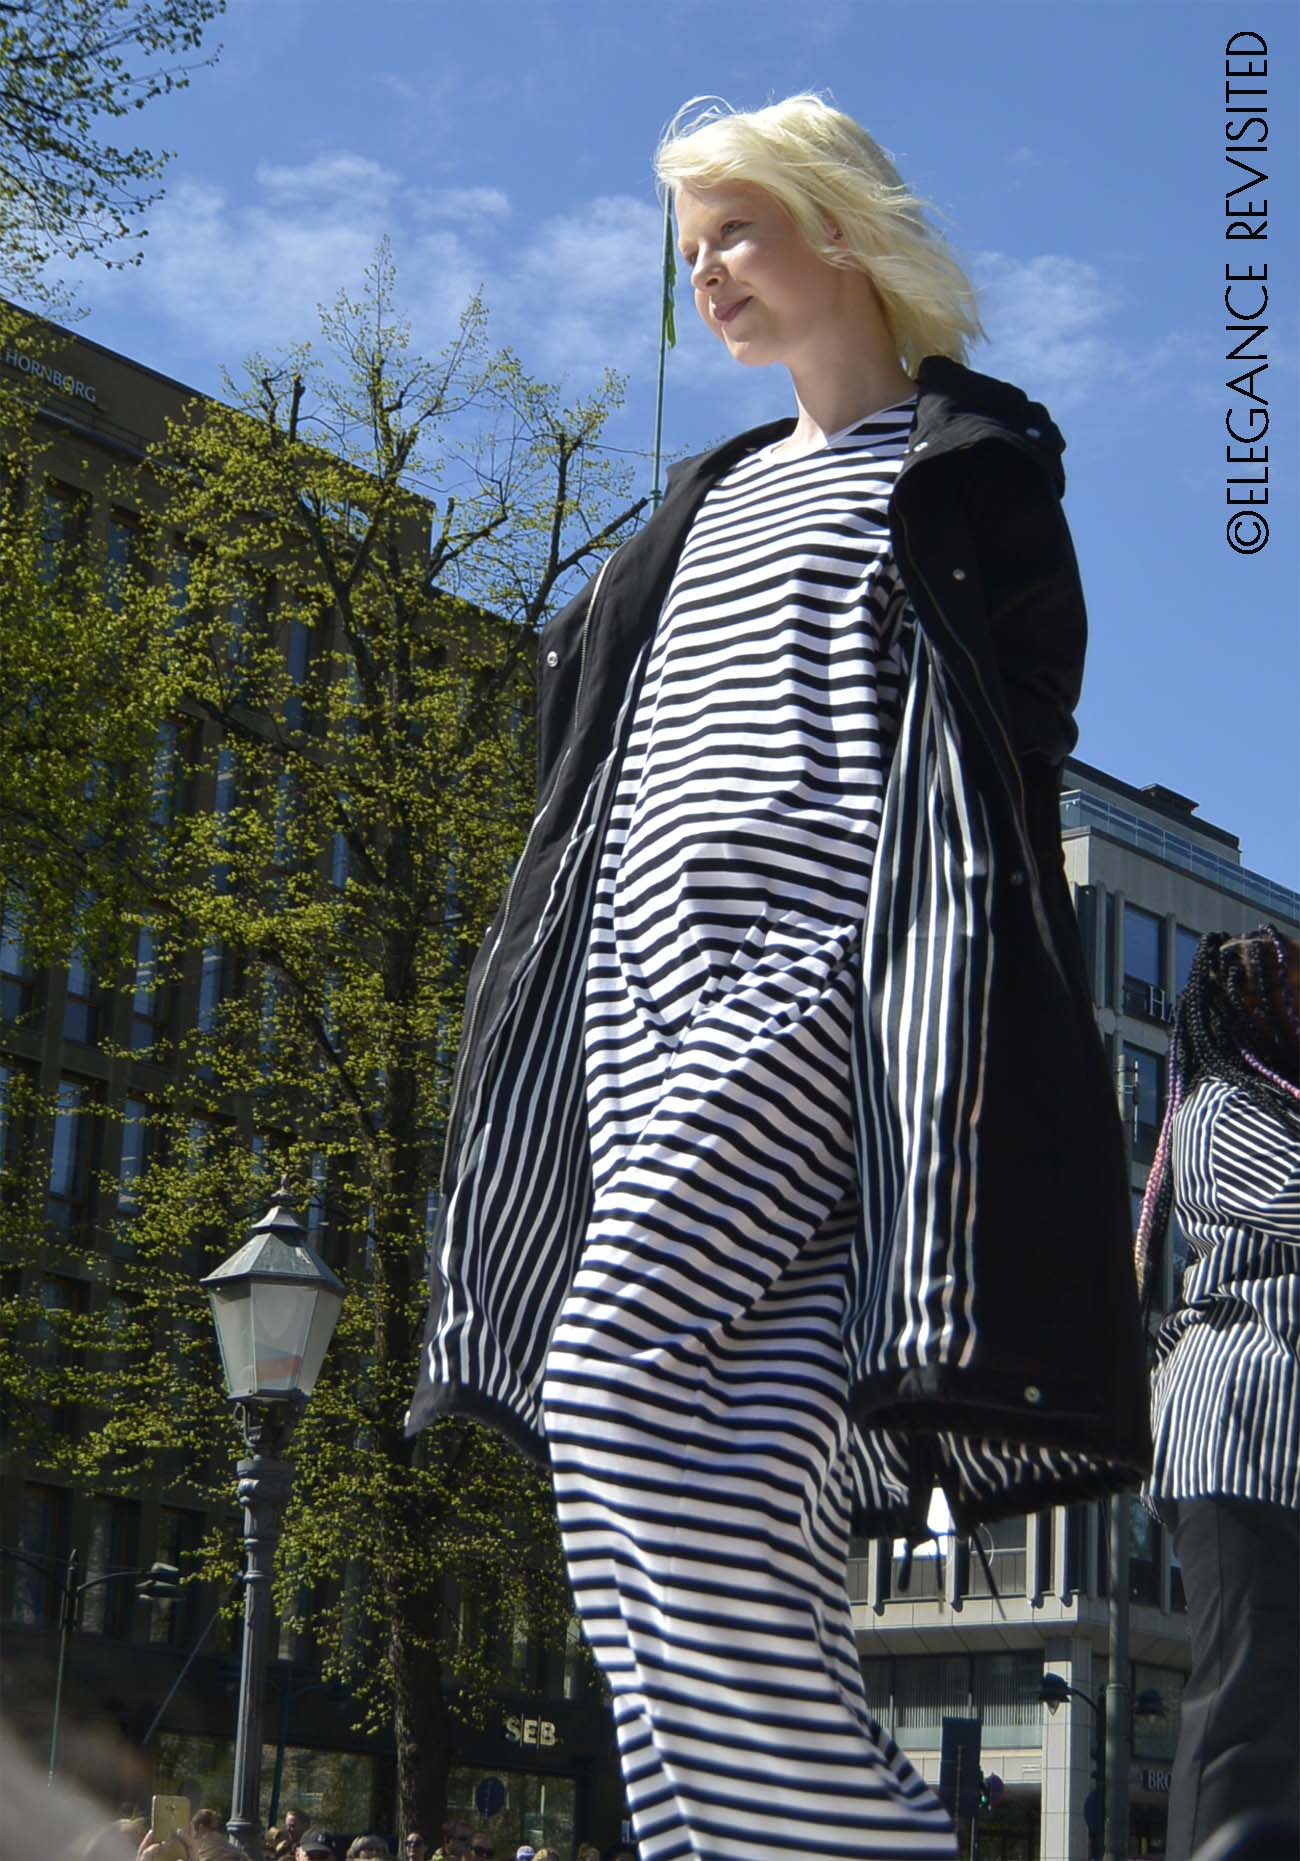 Marimekko stripes